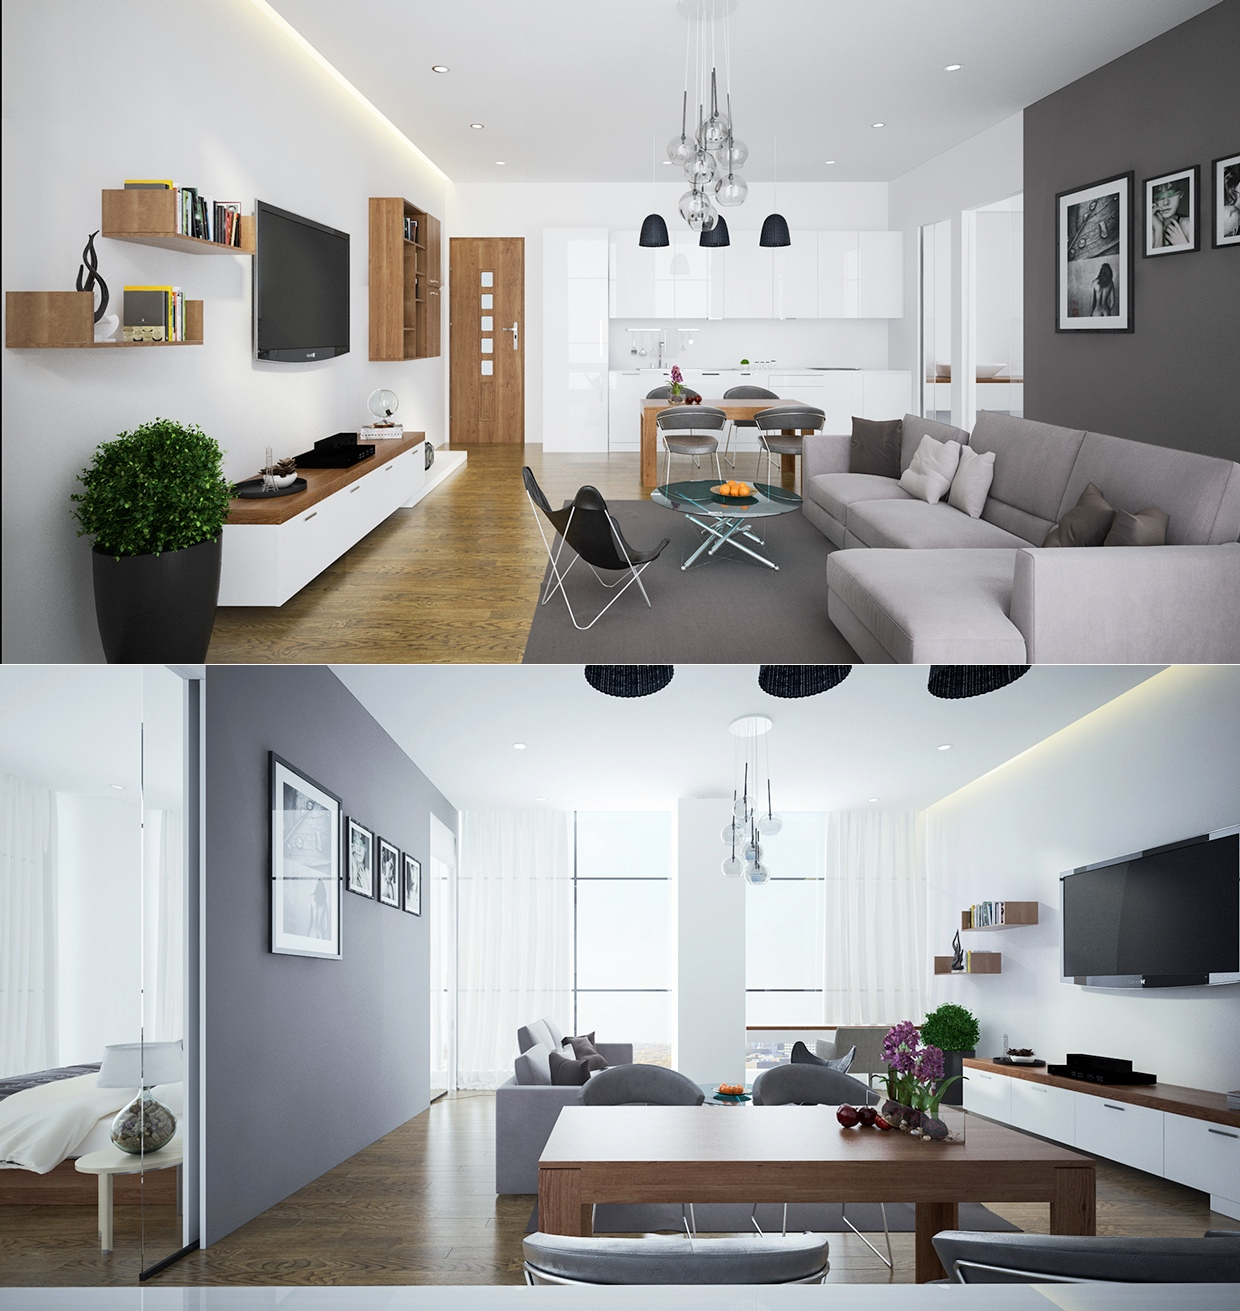 Open Plan Kitchen Apartment Designs: Find The Suitable Open Plan Apartment Designs With